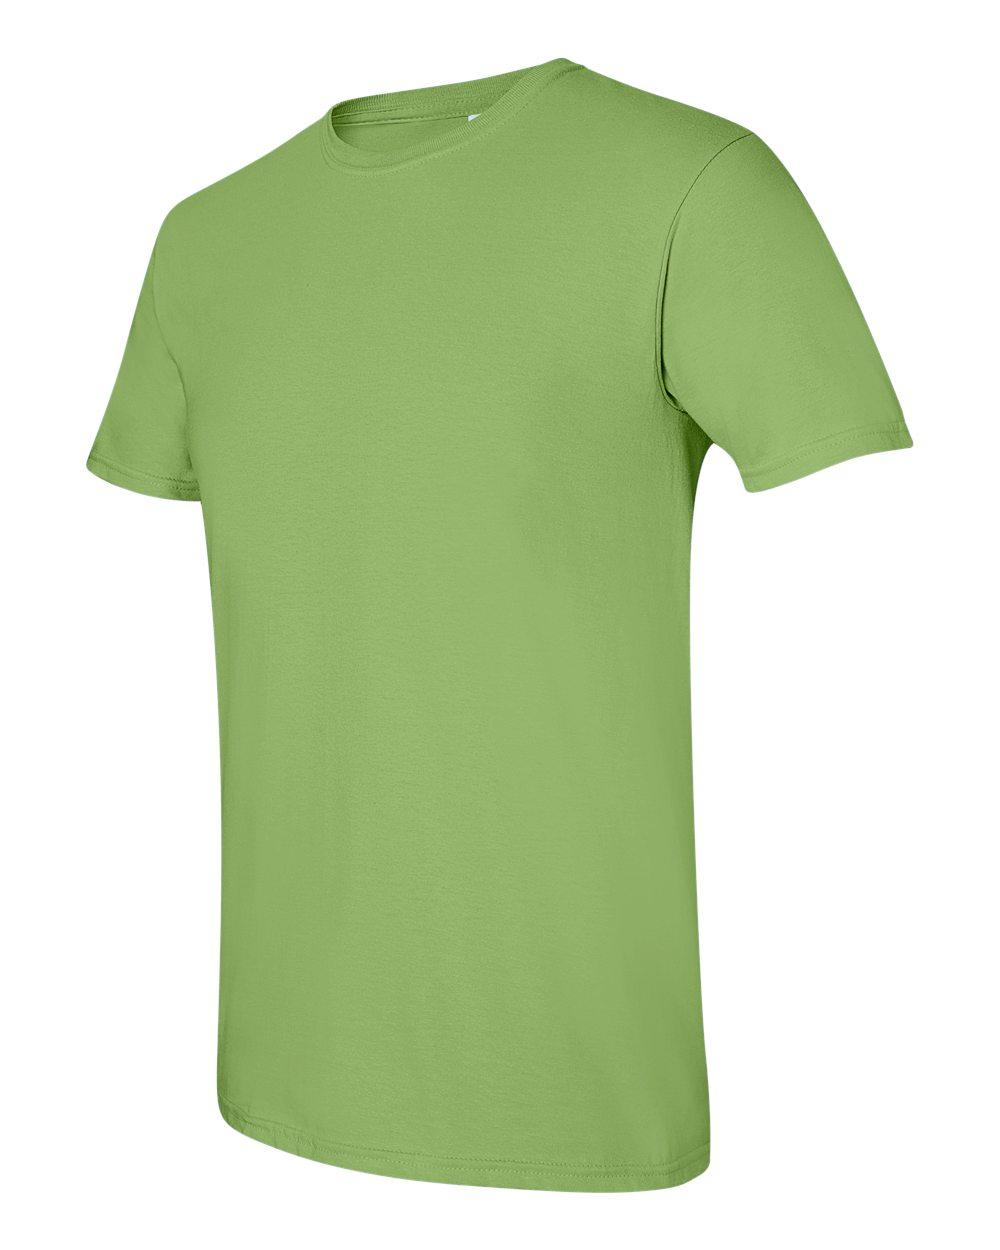 40e96d9d0 Gildan 64000 - Softstyle T-Shirt - Friendly Arctic Printing